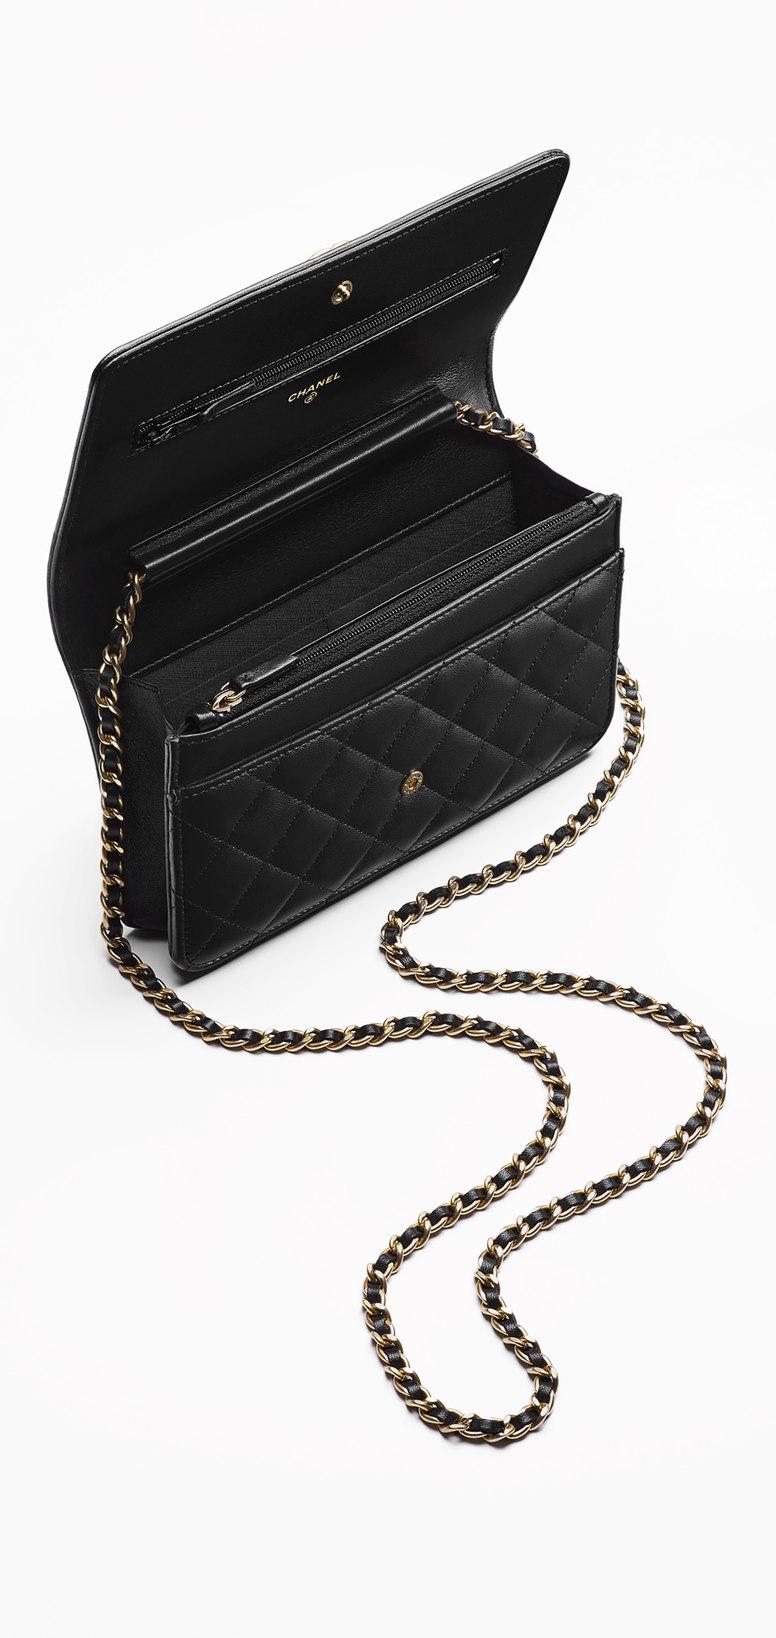 908ad629527b Price Comparison: Chanel Boy Wallet On Chain - ShopandBox